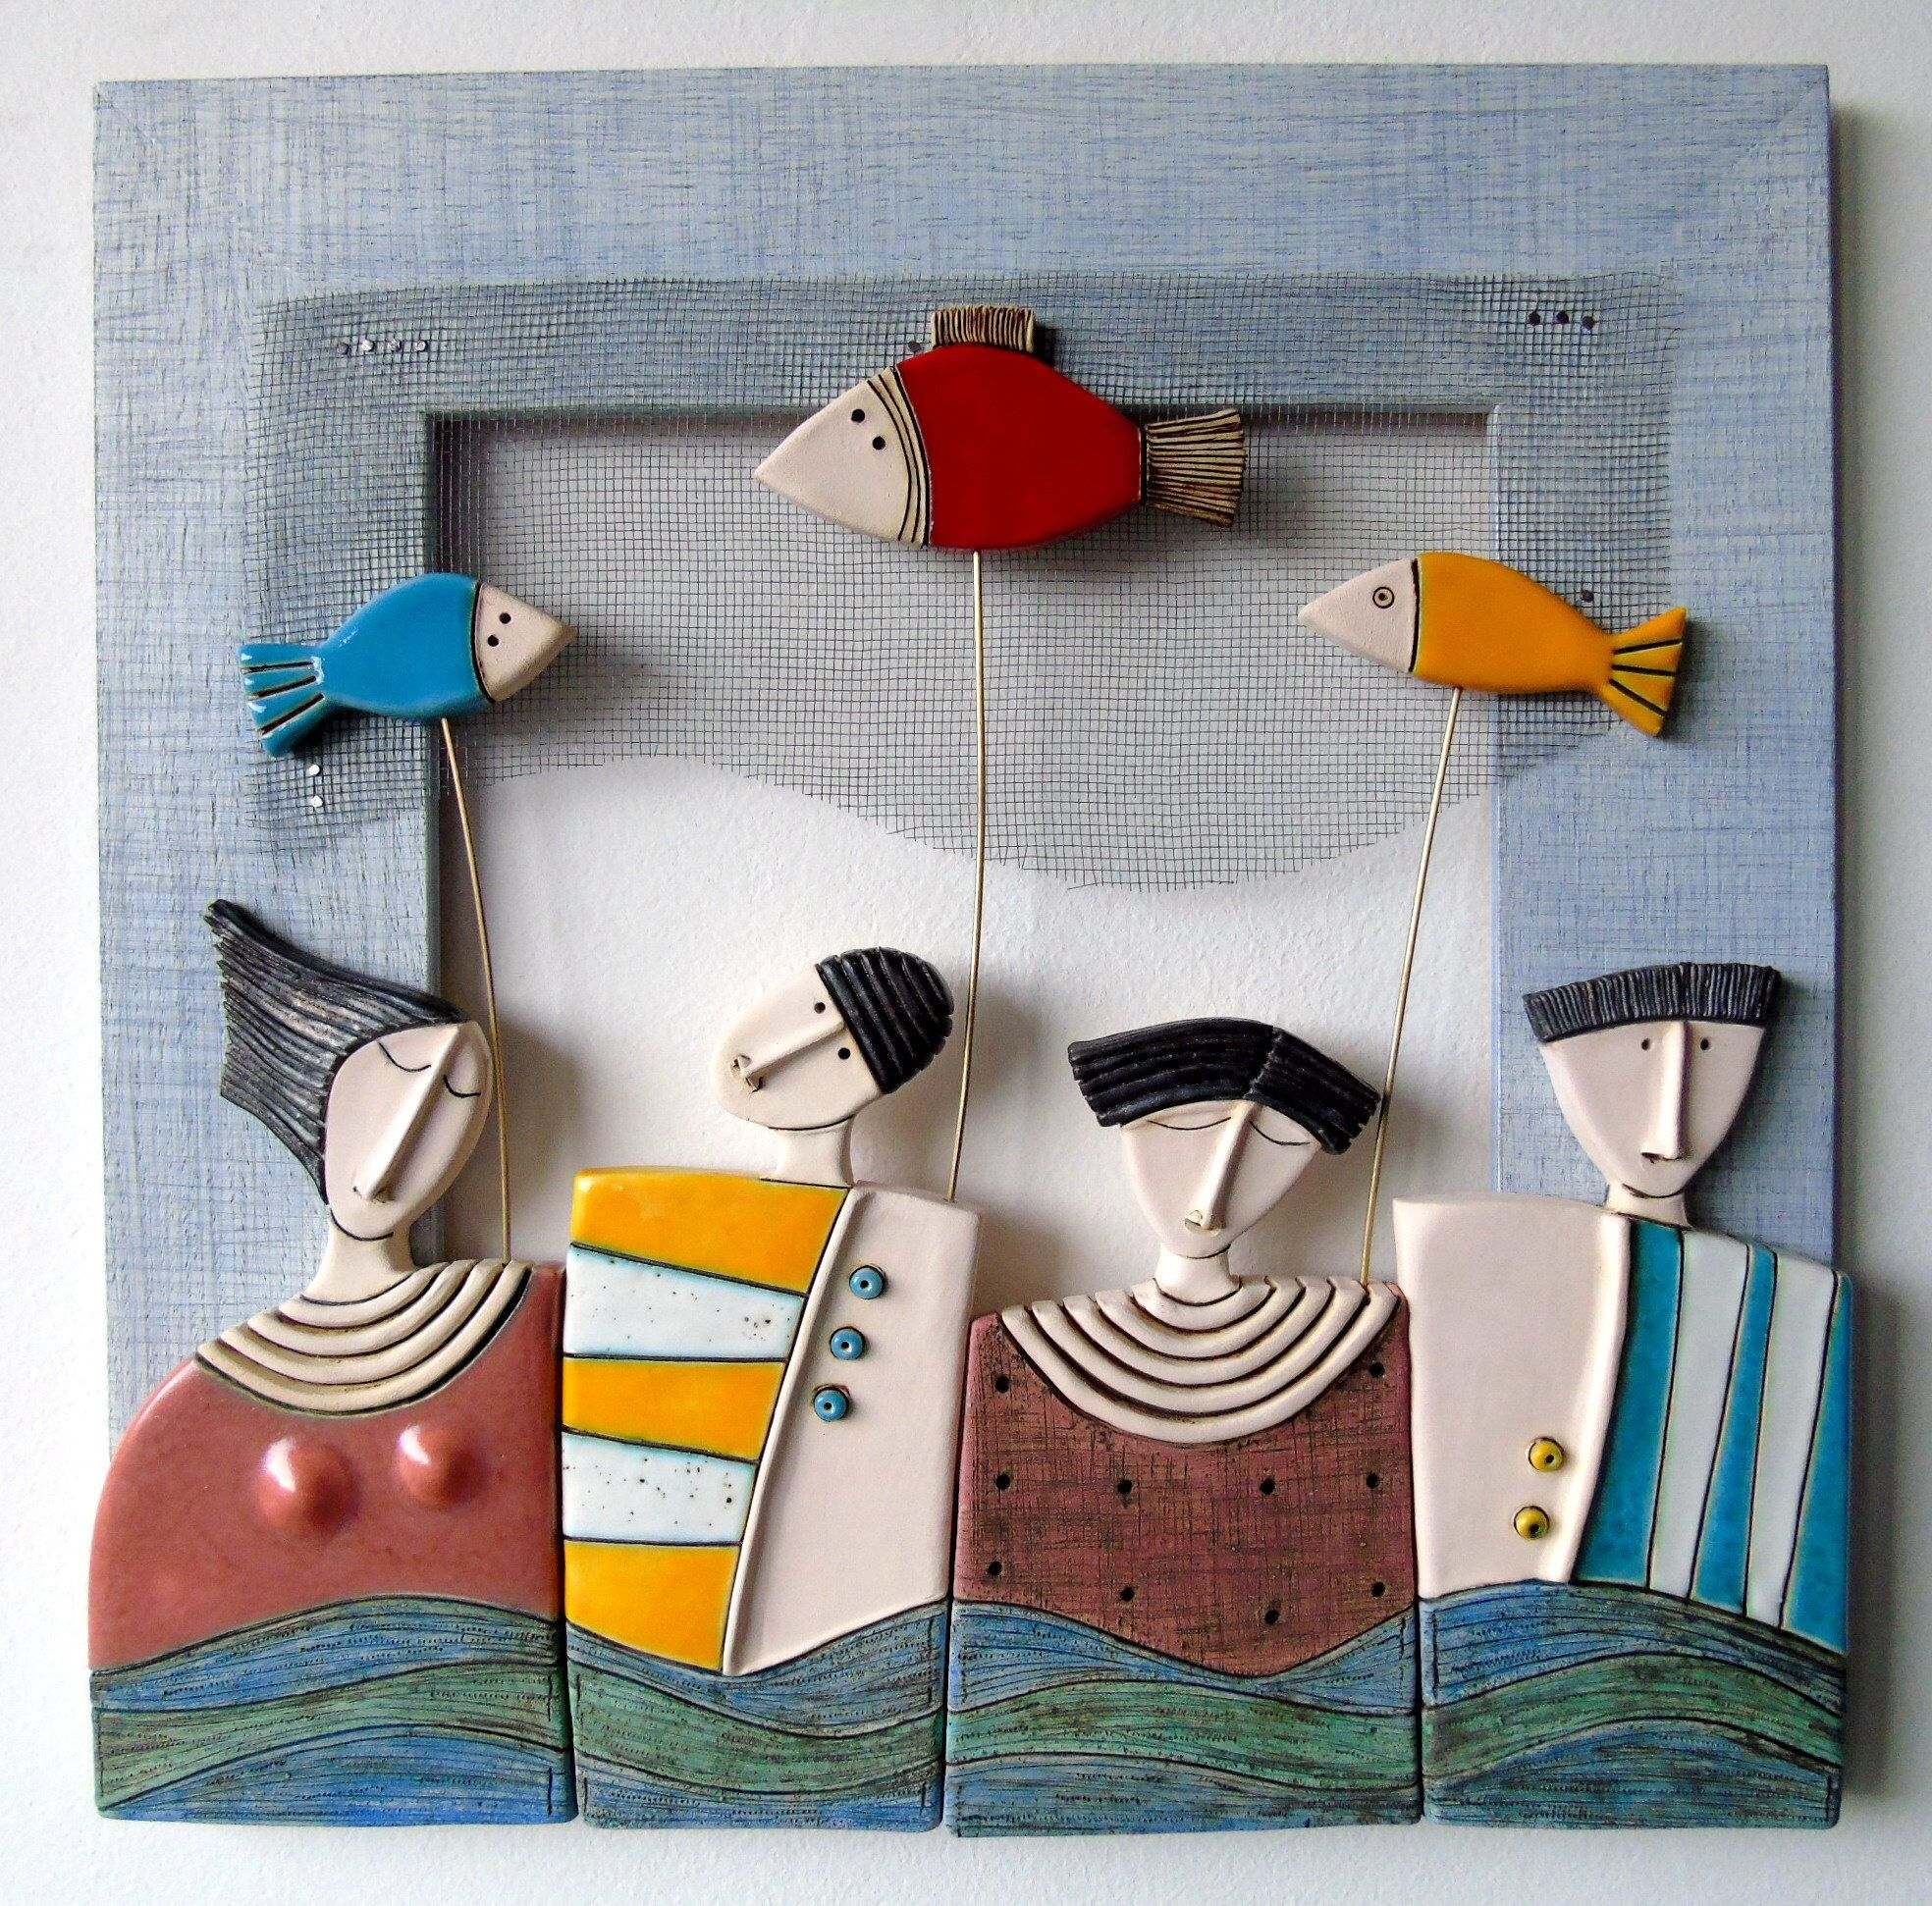 Fishing-Ceramic art ,Ceramic sculpture,Handmade ceramics,Wall art ceramics,Hanging on a wall -   - #Art #ceramic #ceramicart #ceramicpottery #ceramics #ceramicsHanging #ceramicsWall #fishing #FishingCeramic #handmade #handmadeceramics #sculpture #sculptureHandmade #wall